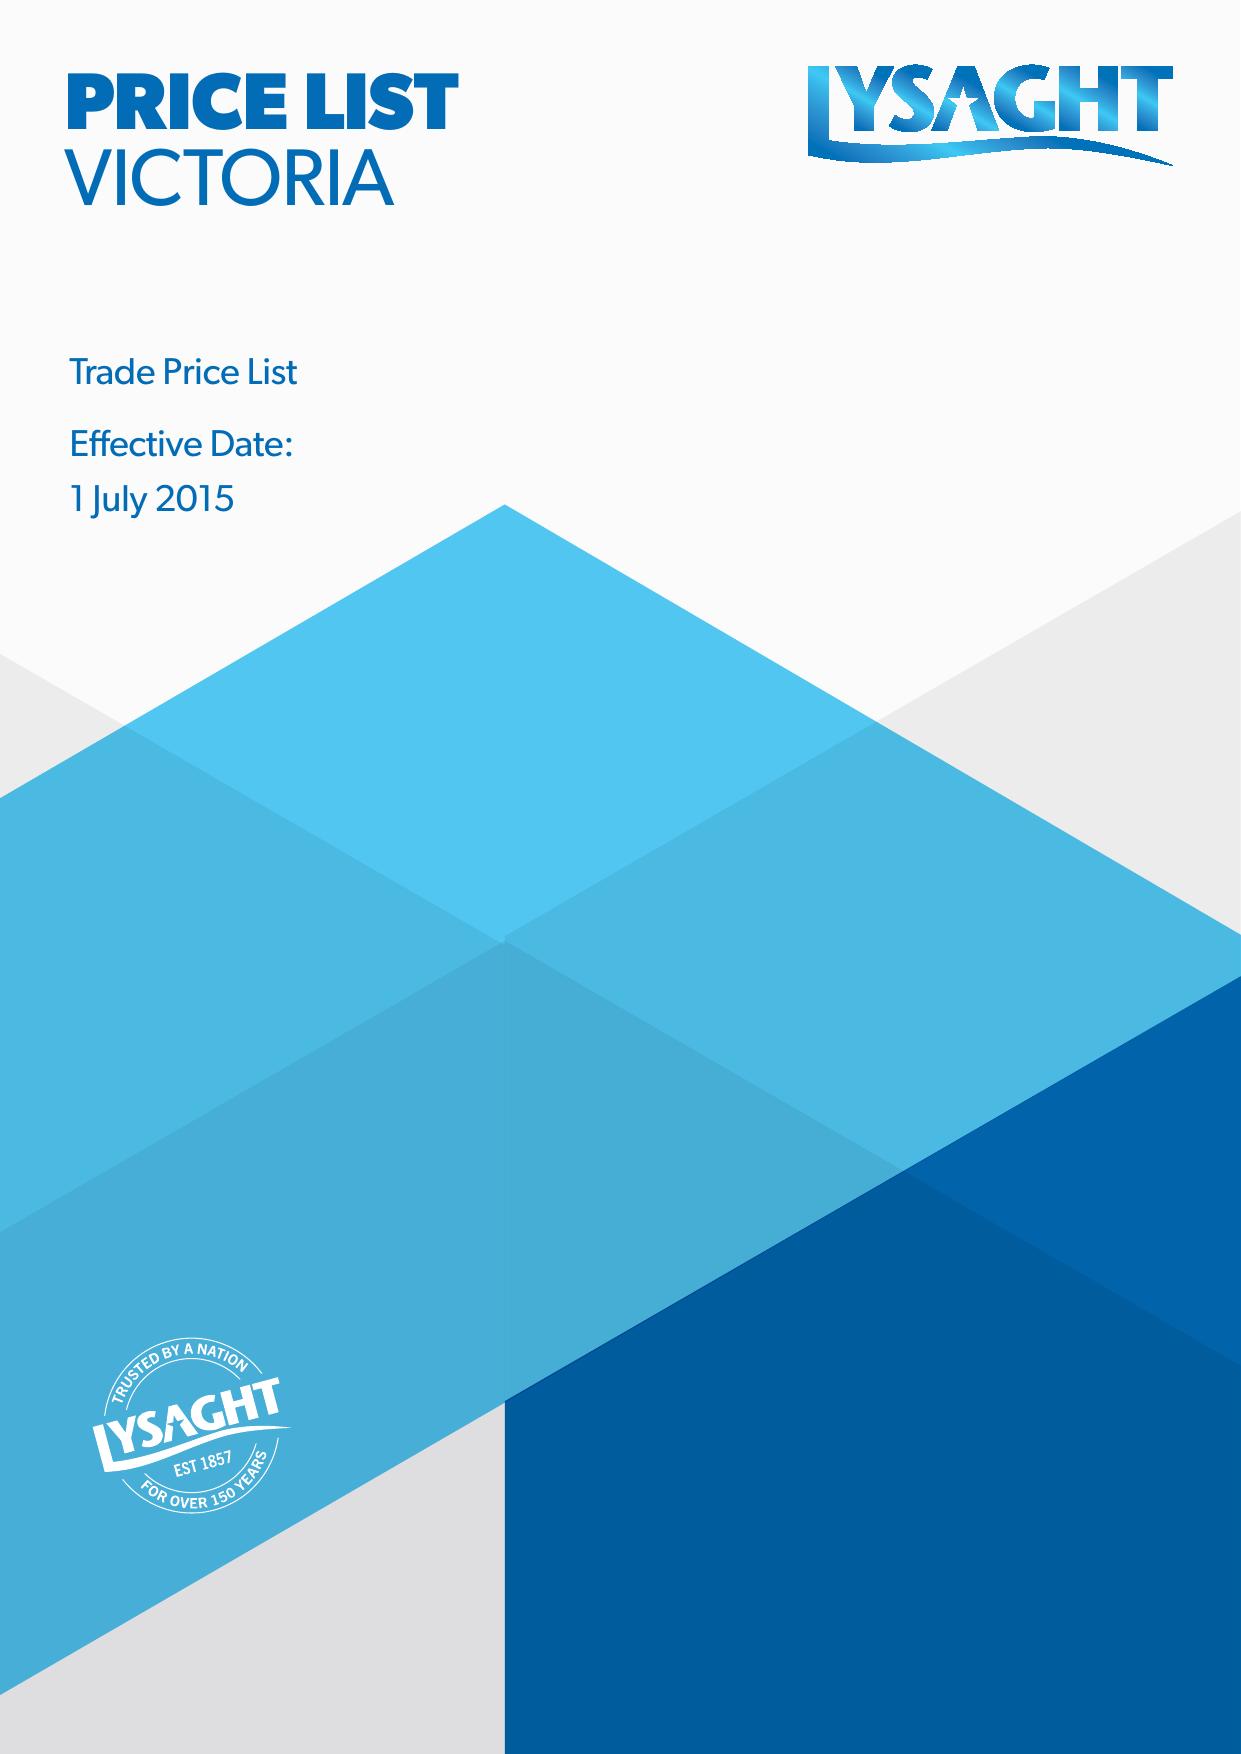 price list victoria - Lysaght Professionals | manualzz com